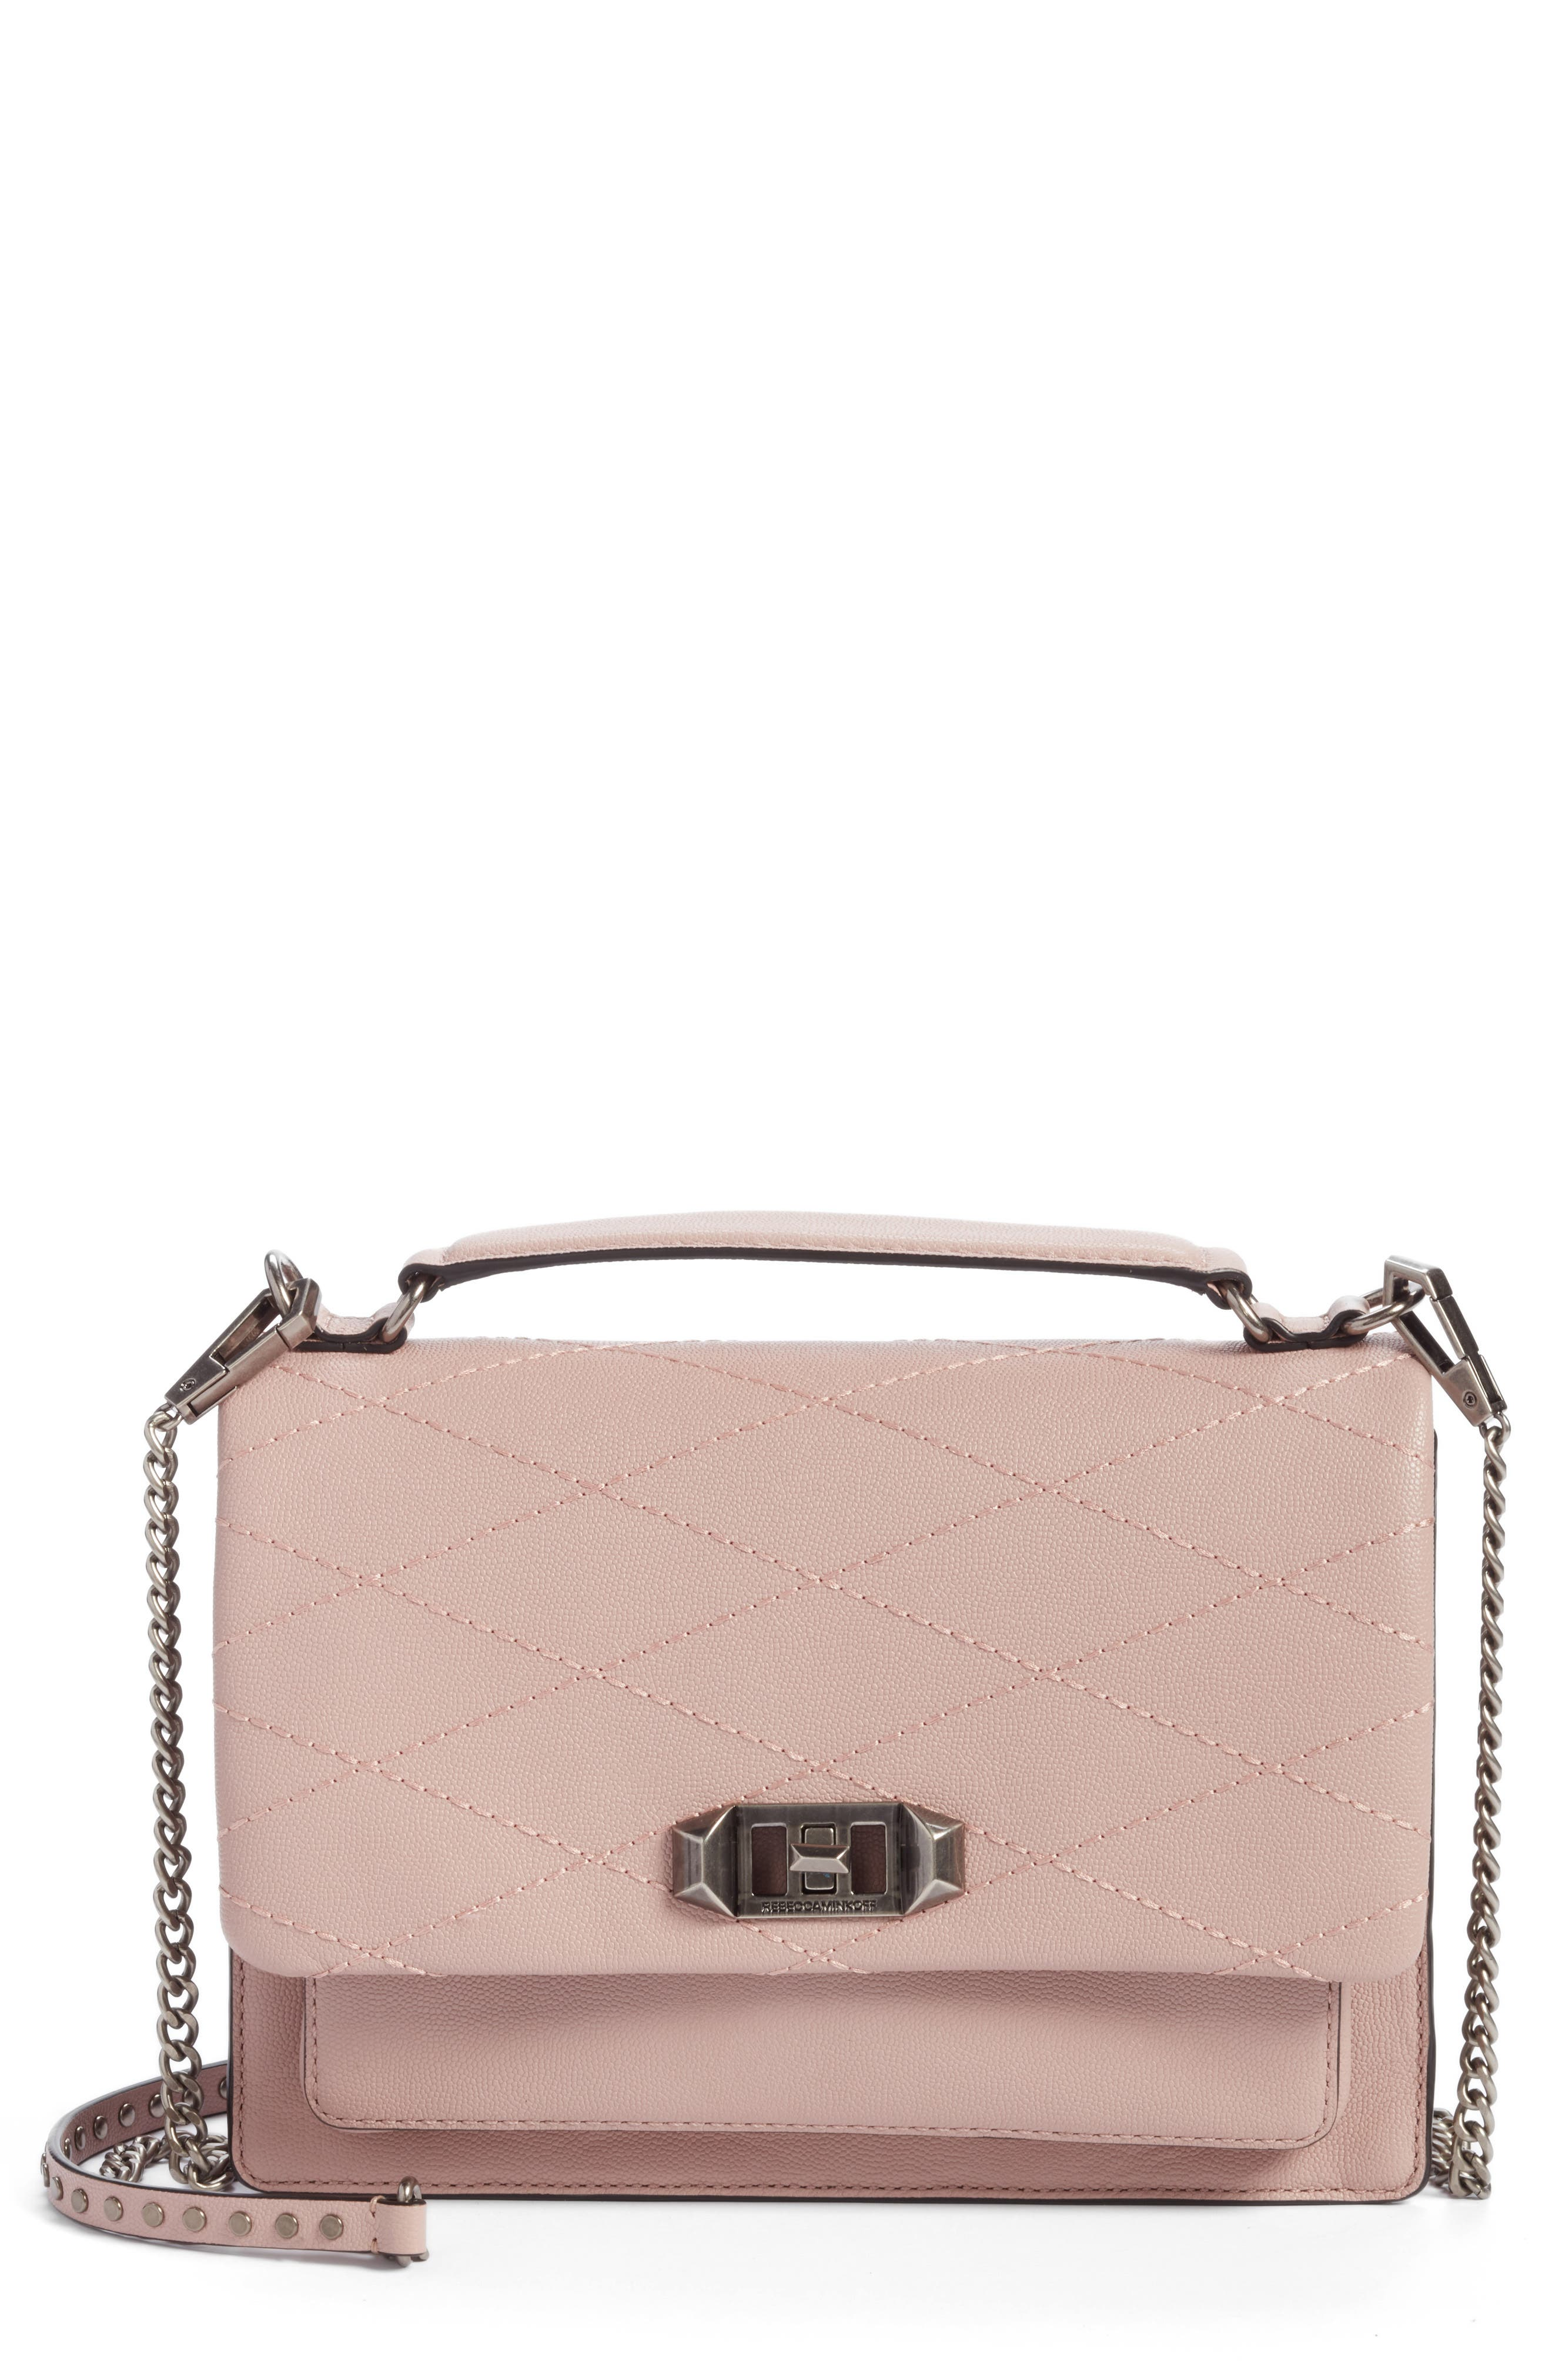 Medium Je T'aime Convertible Leather Crossbody Bag,                             Main thumbnail 1, color,                             Vintage Pink